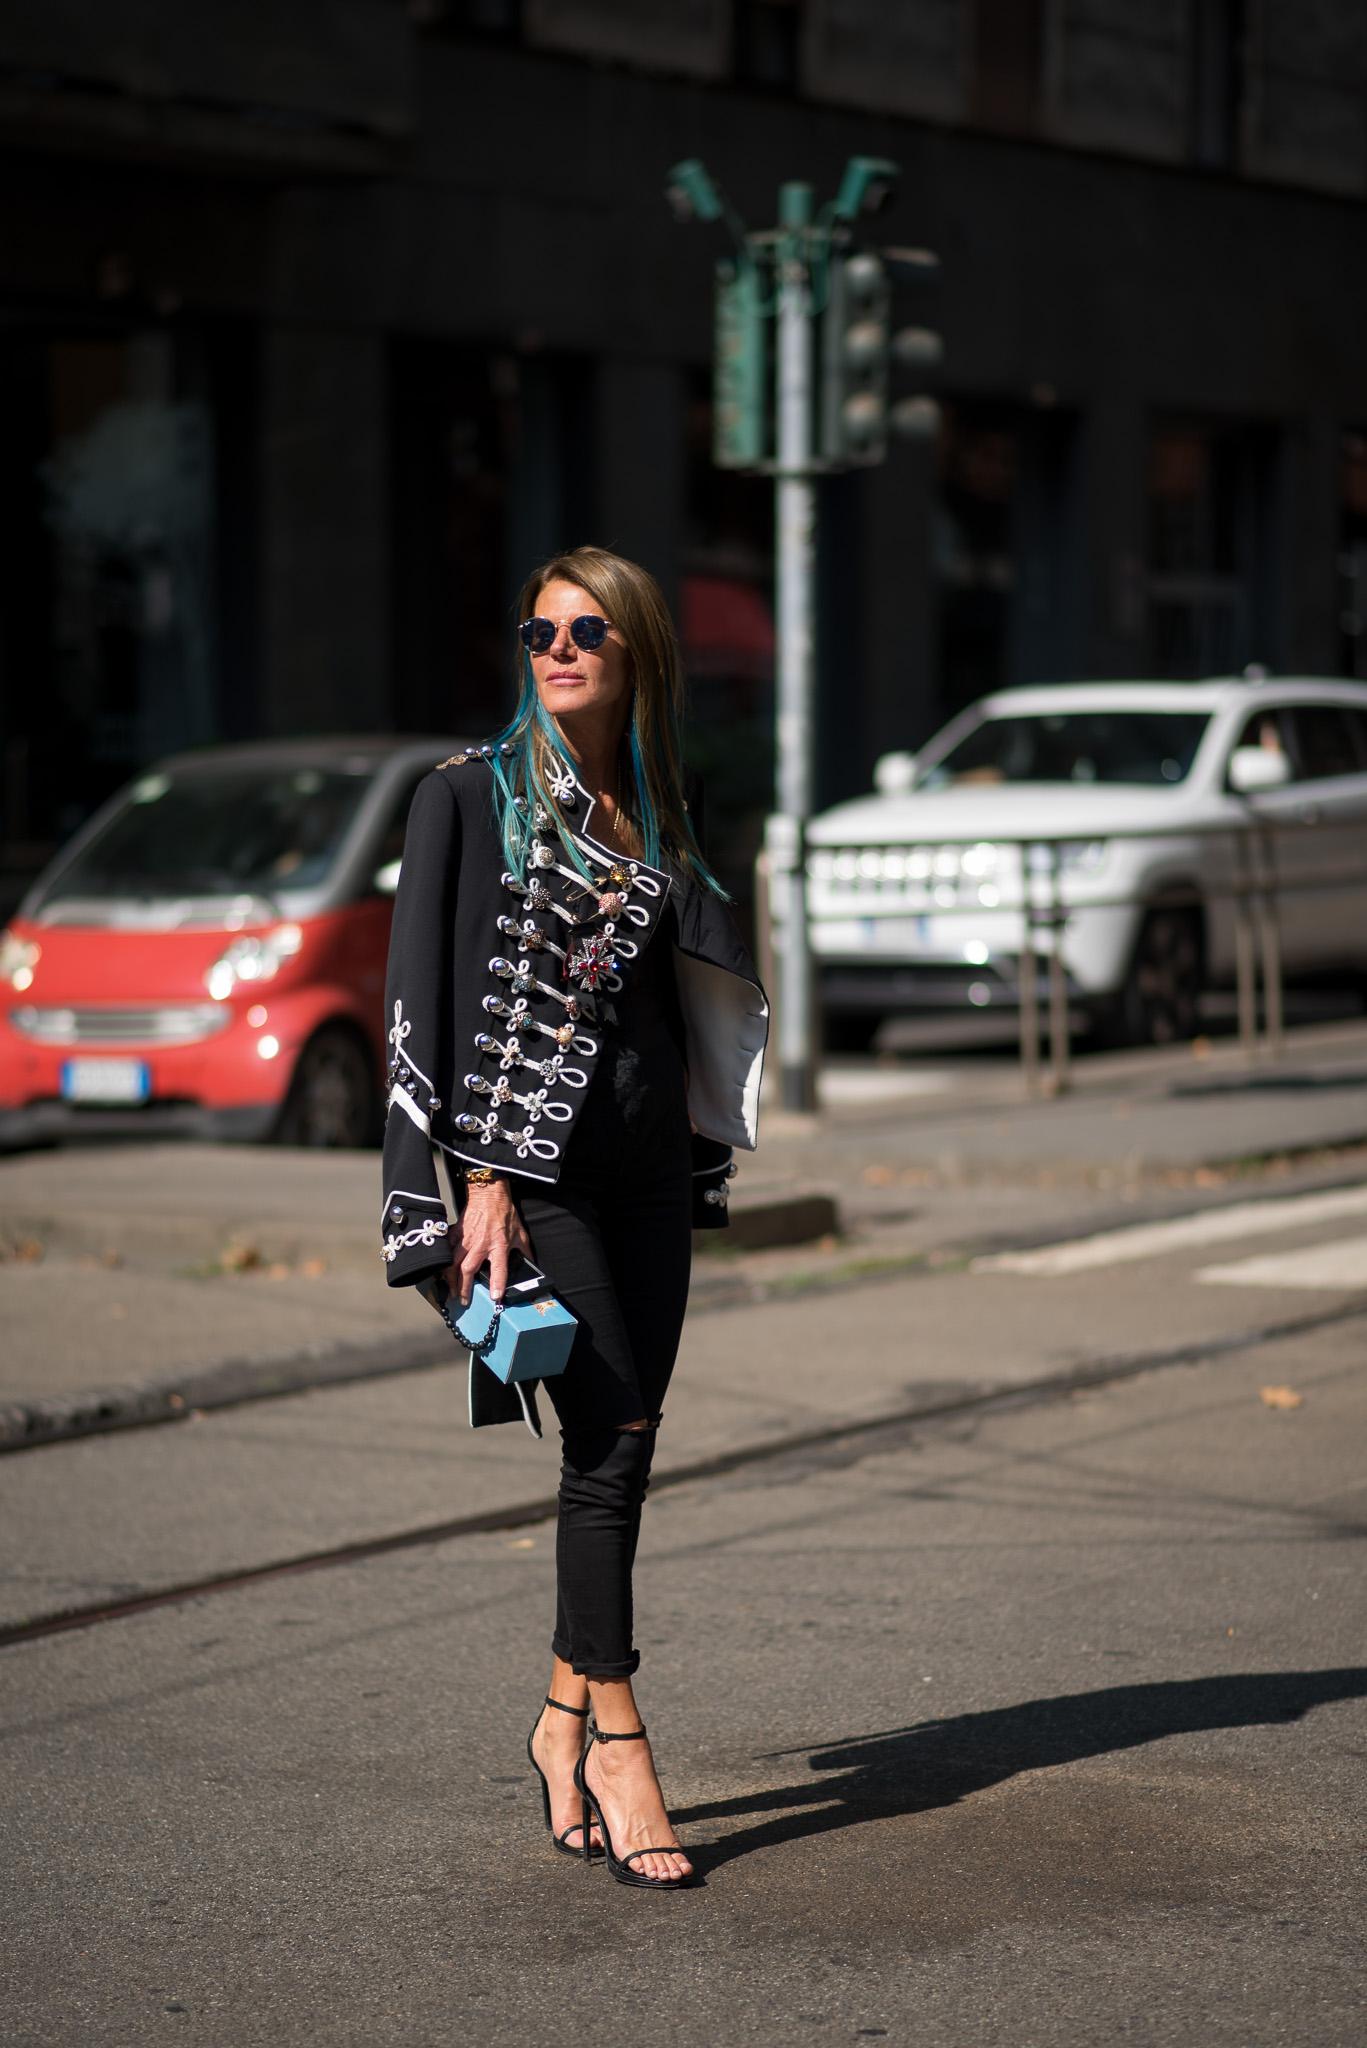 anna-dello-russo_dolce-gabbana_milan-fashion-week_sept-2016_photography-annika-lagerqvist_www-annikasomething-com-1